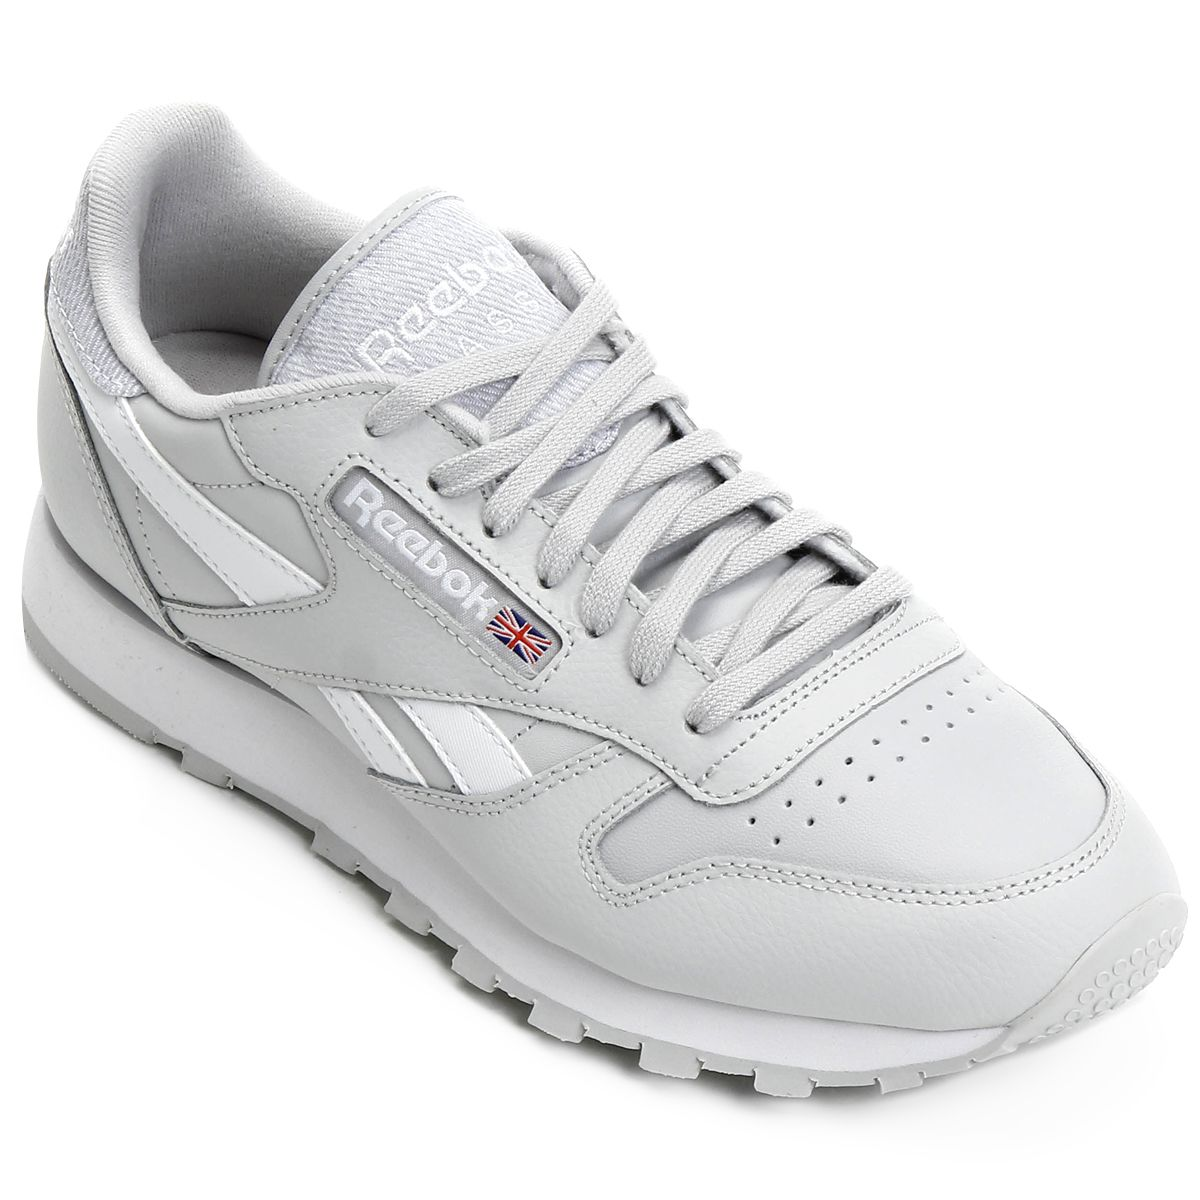 80d9f18f494 ... greece nike cortez basic leather netshoes c7d89 60c3a